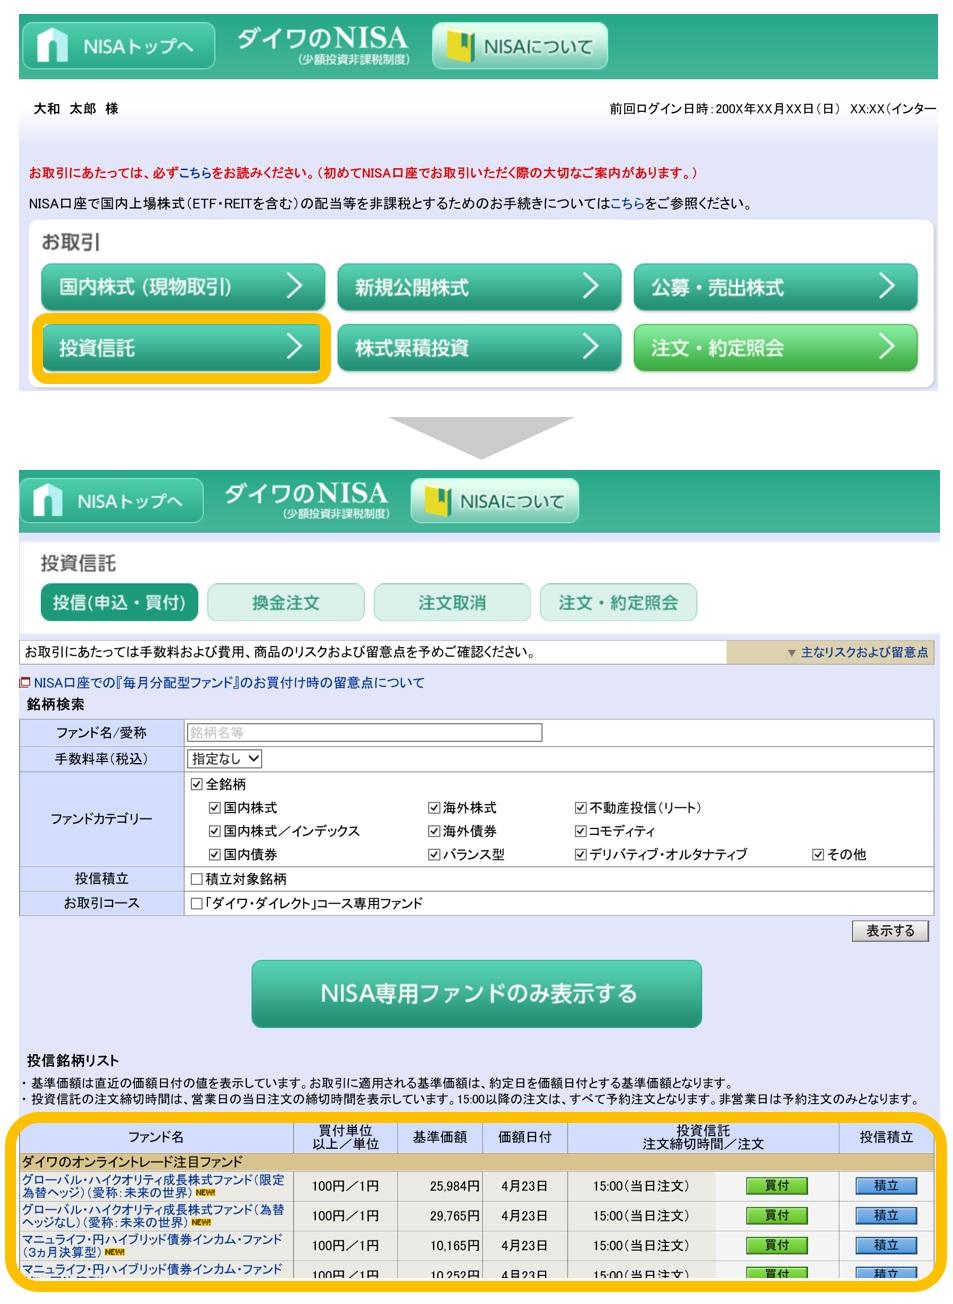 NISA購入可能ファンド